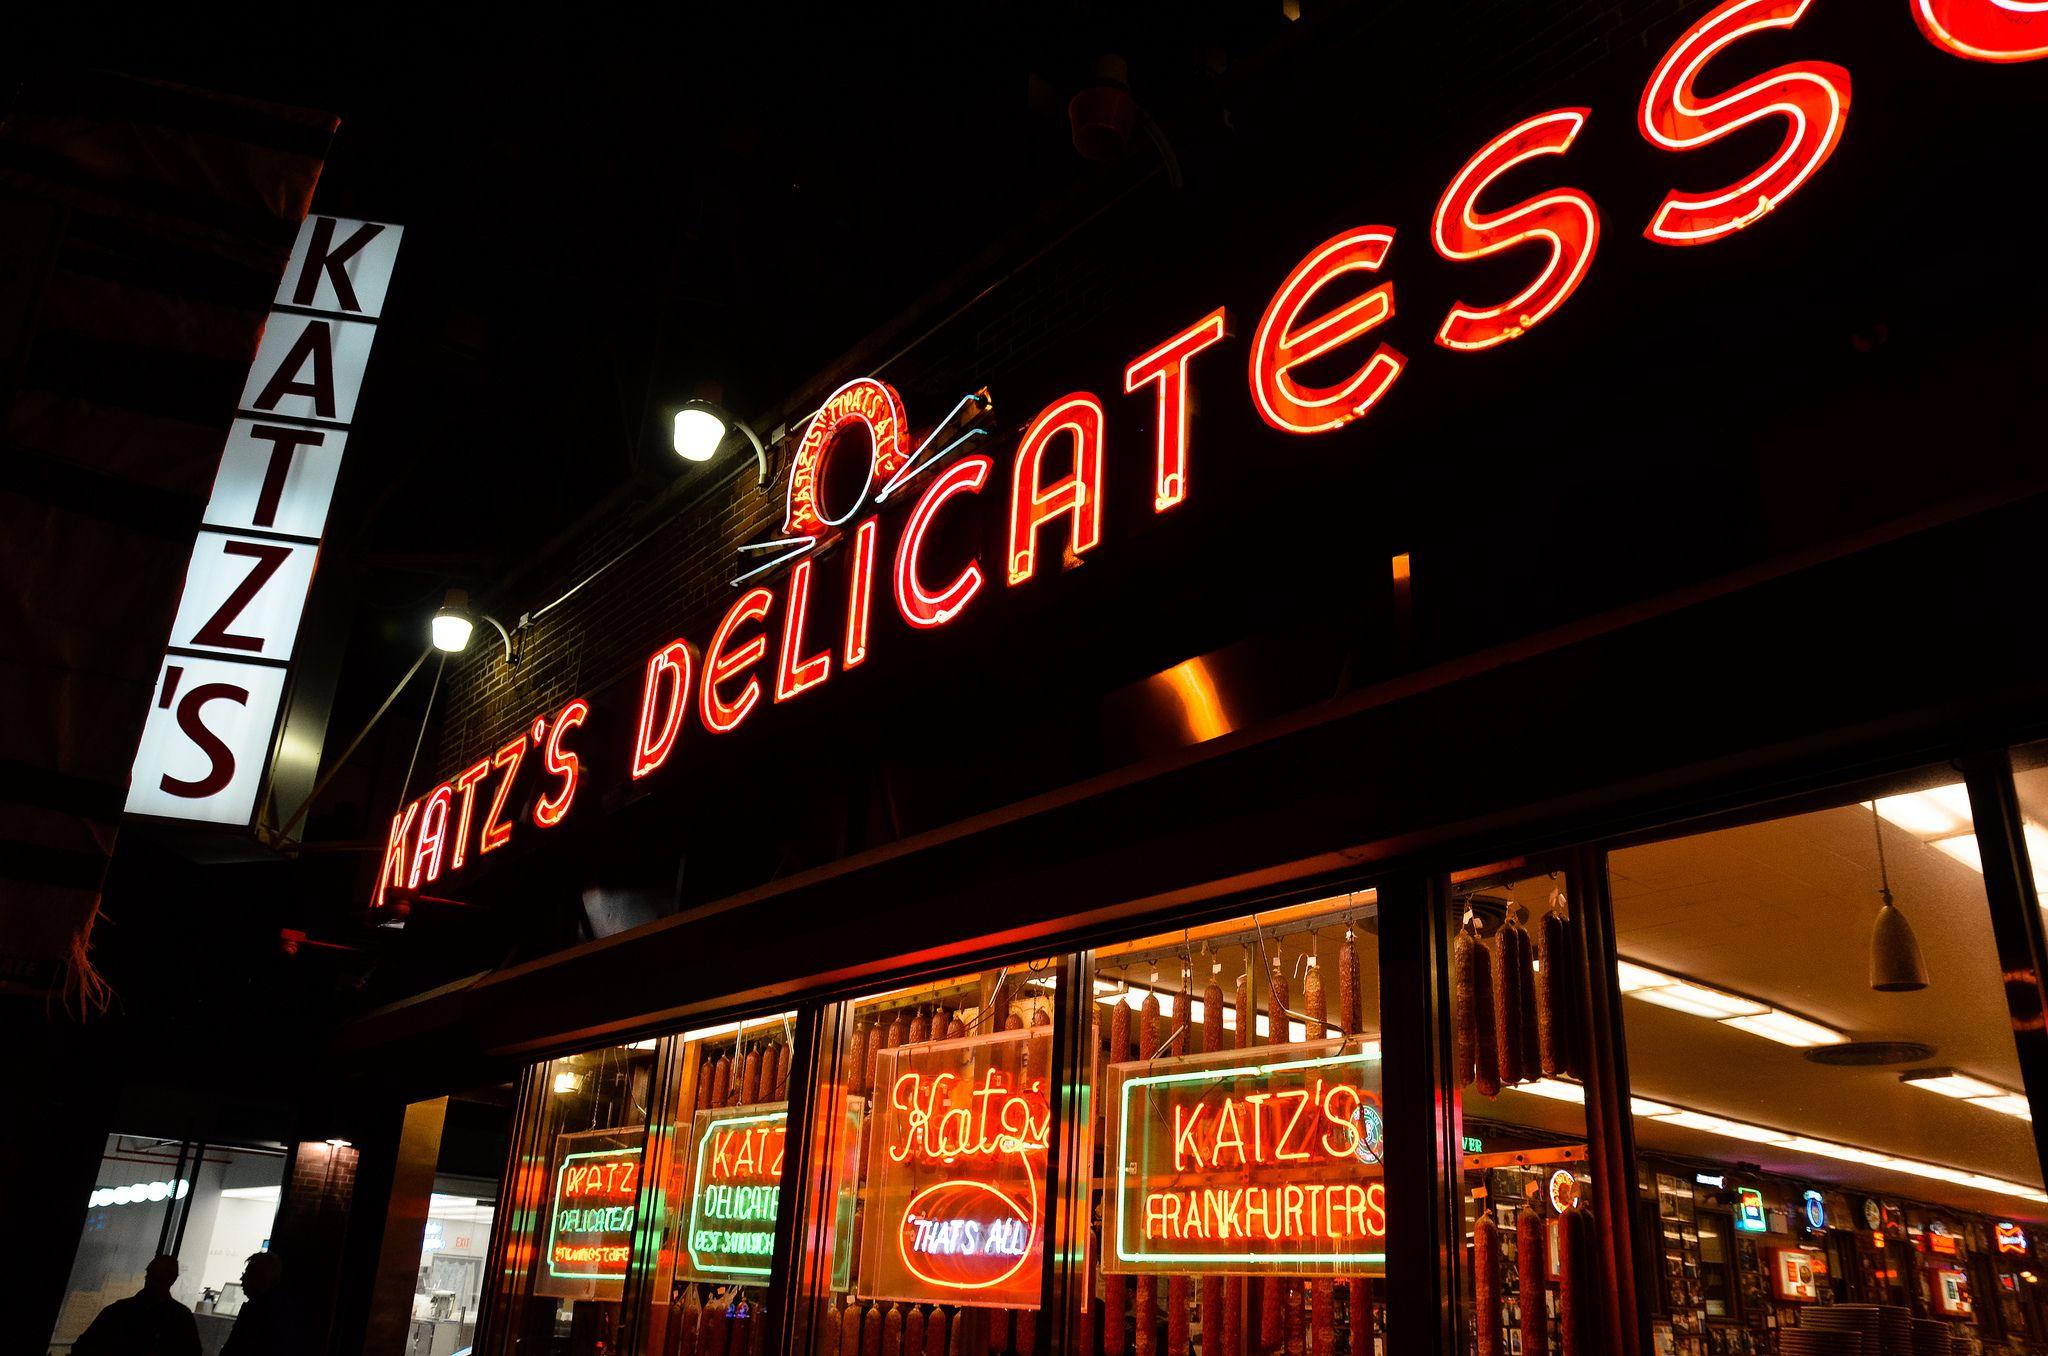 Katz' Delicatessen in New York